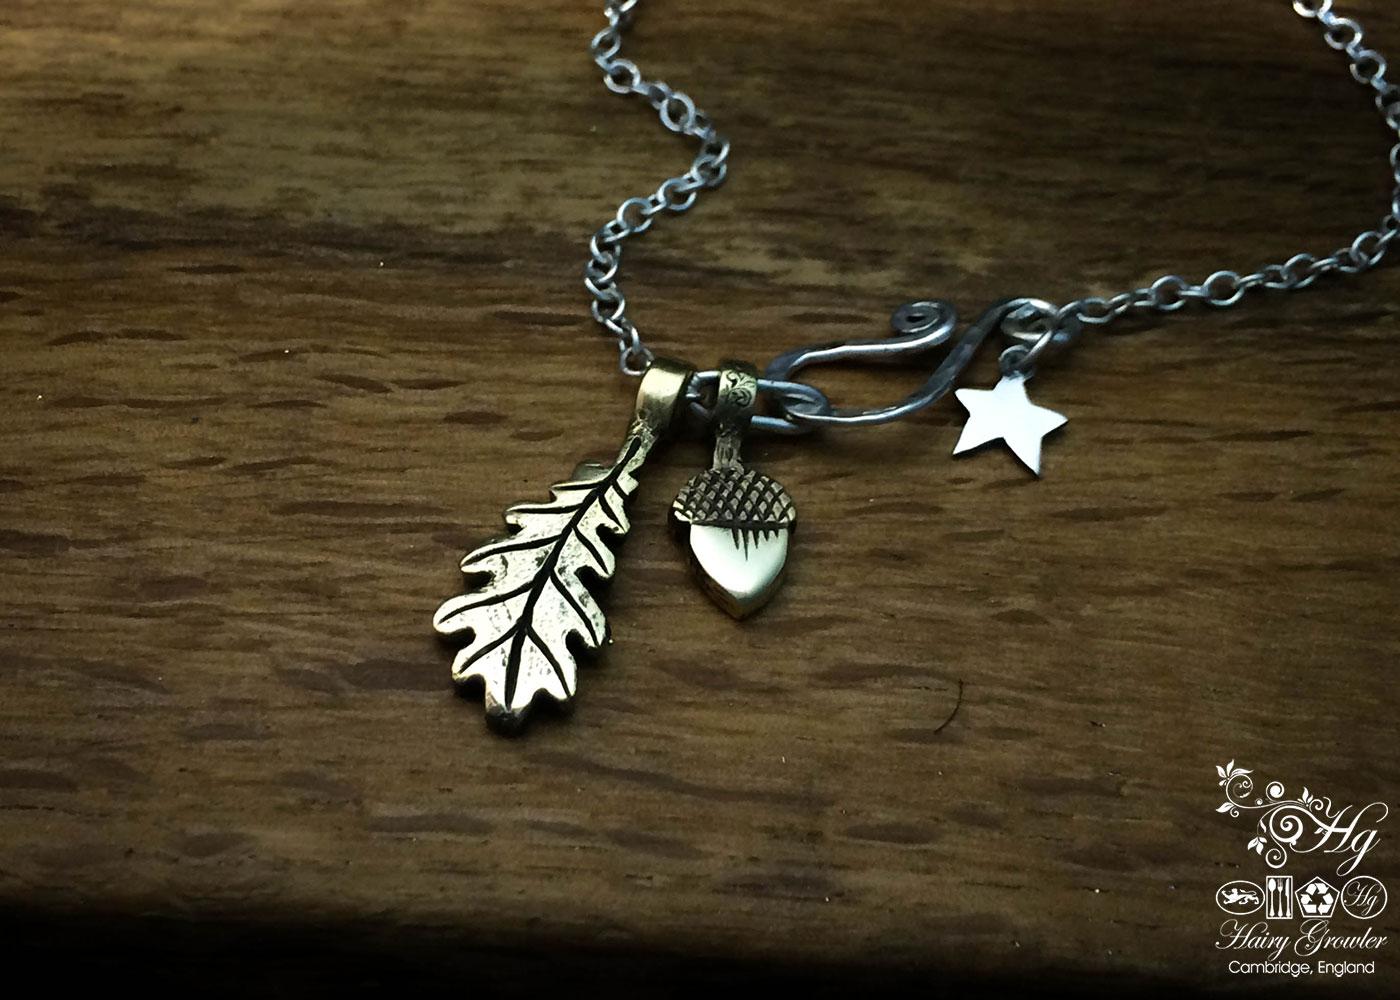 handcrafted silver oak leaf charm for a tree sculpture, necklace or bracelet